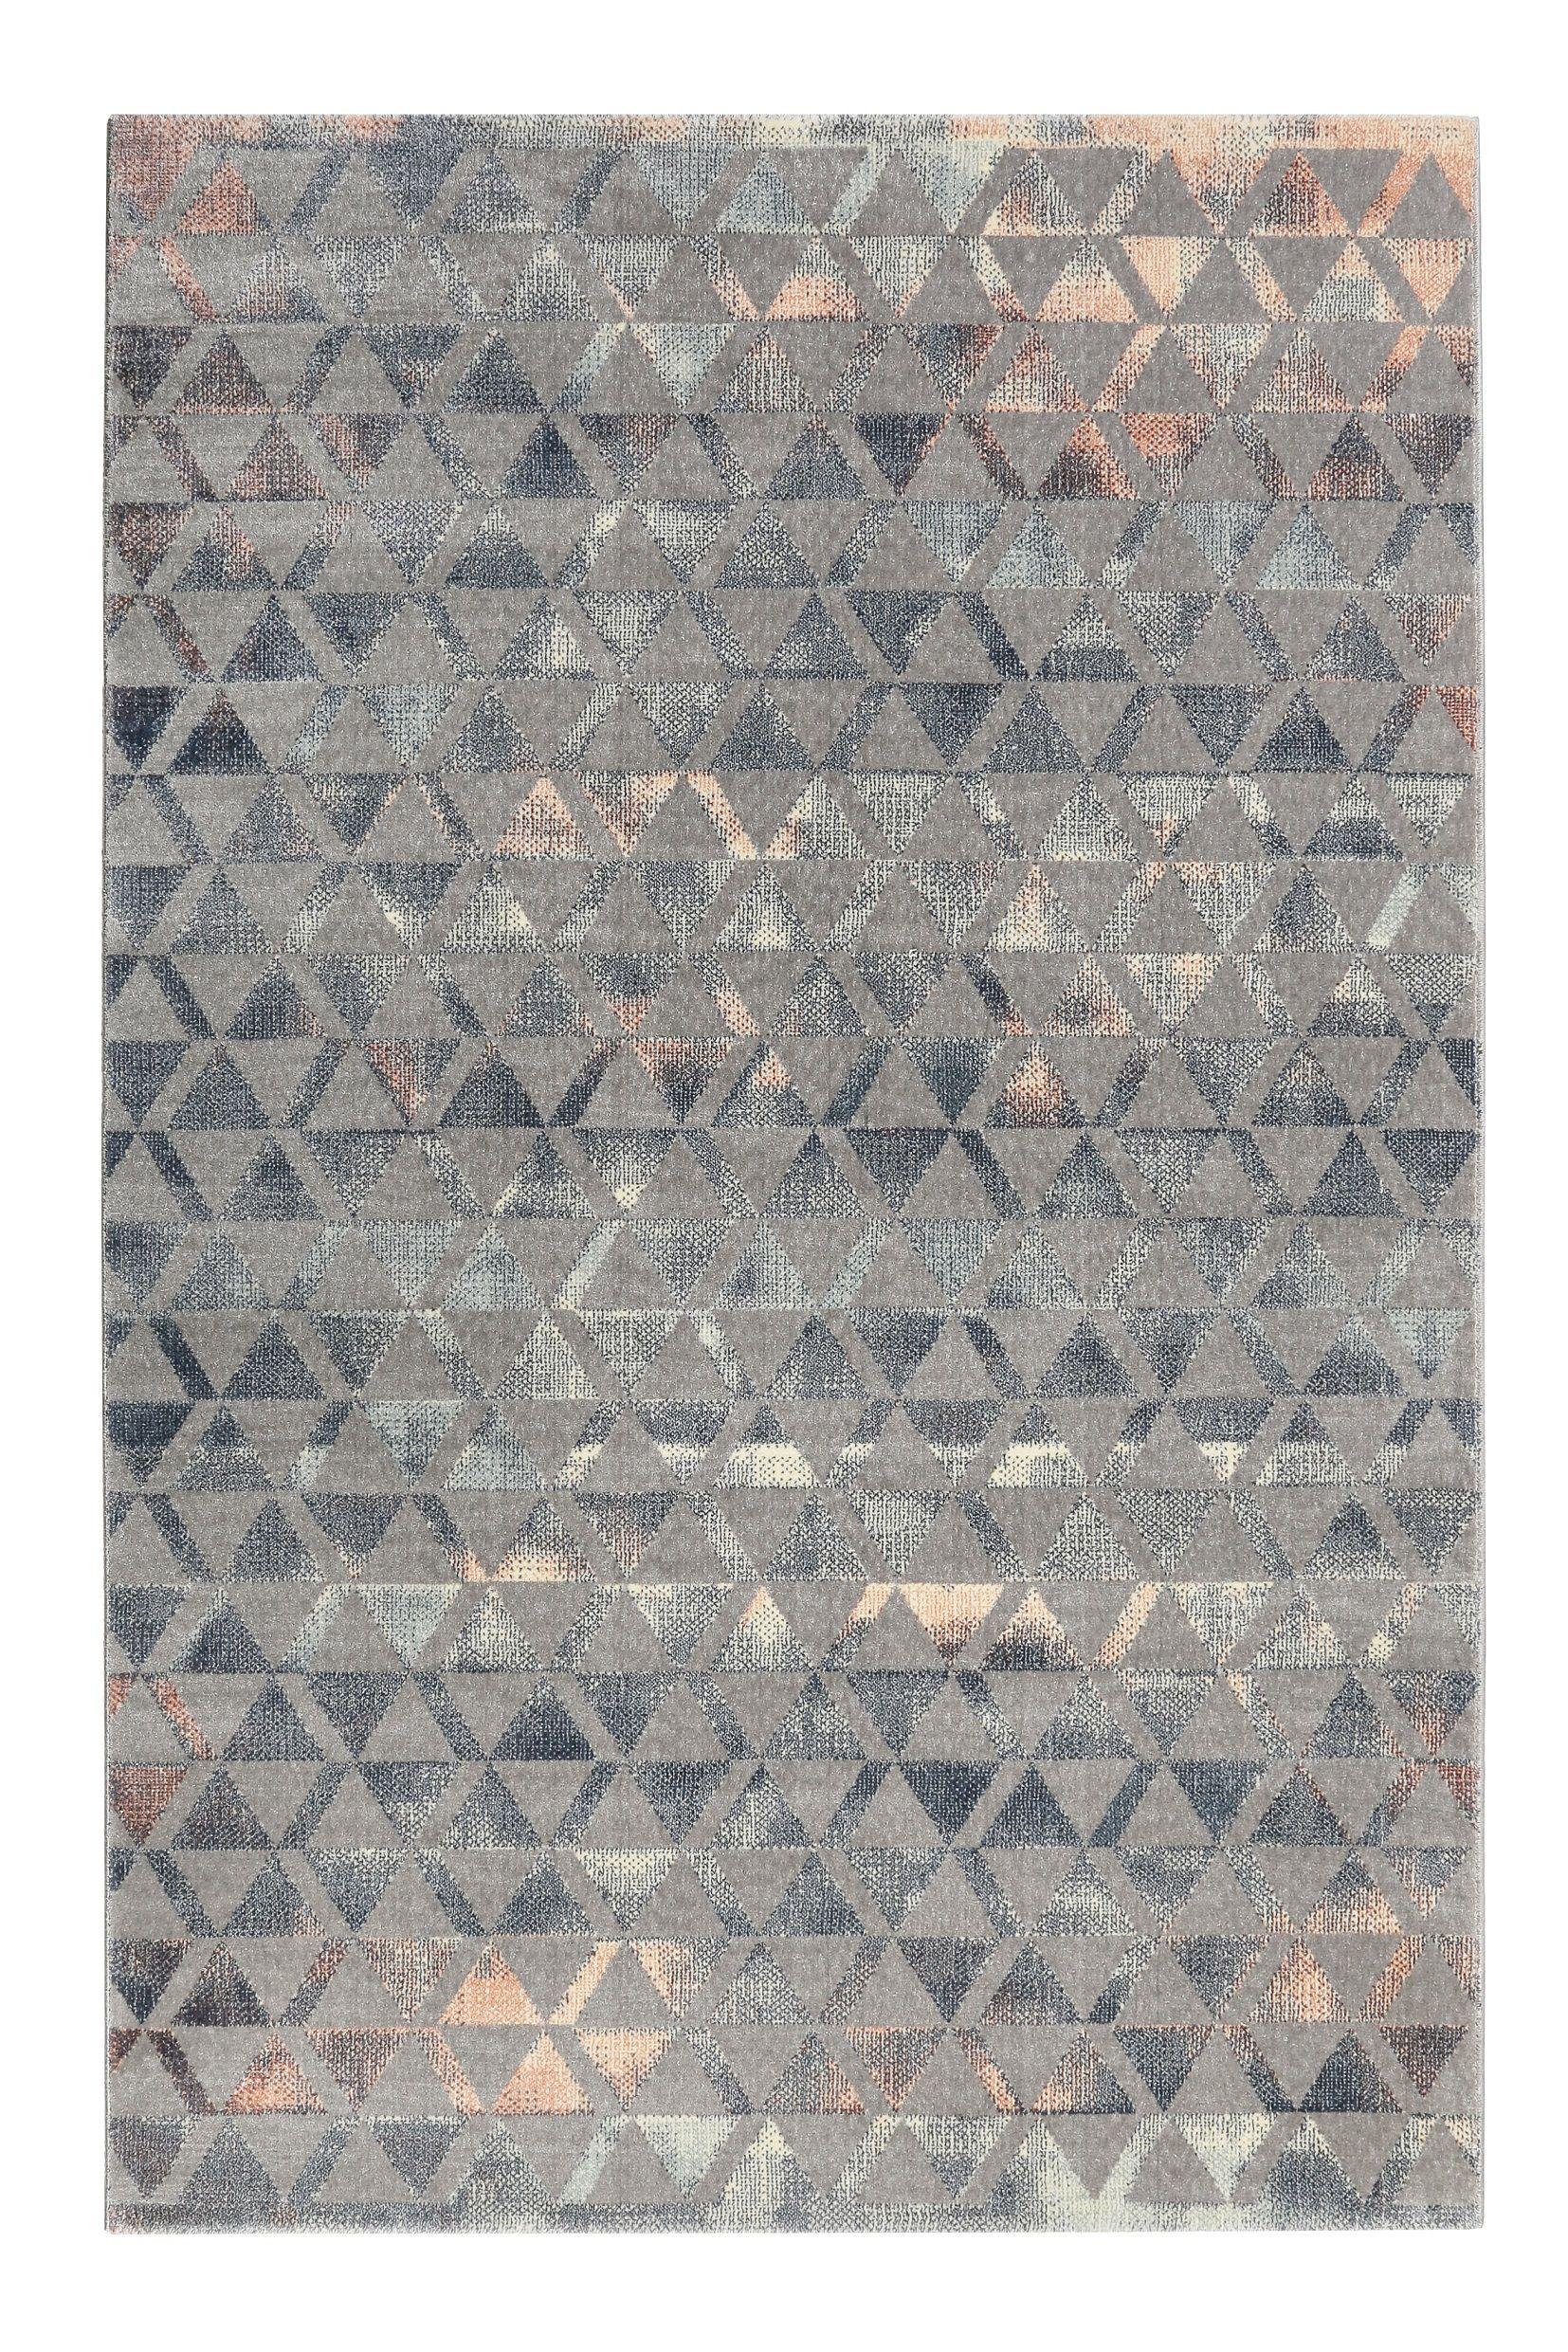 Teppich Grau Taupe Rosa Kurzflor Pearl 2 0 Wecon Home Kurzflor Teppiche Moderne Teppiche Und Rosa